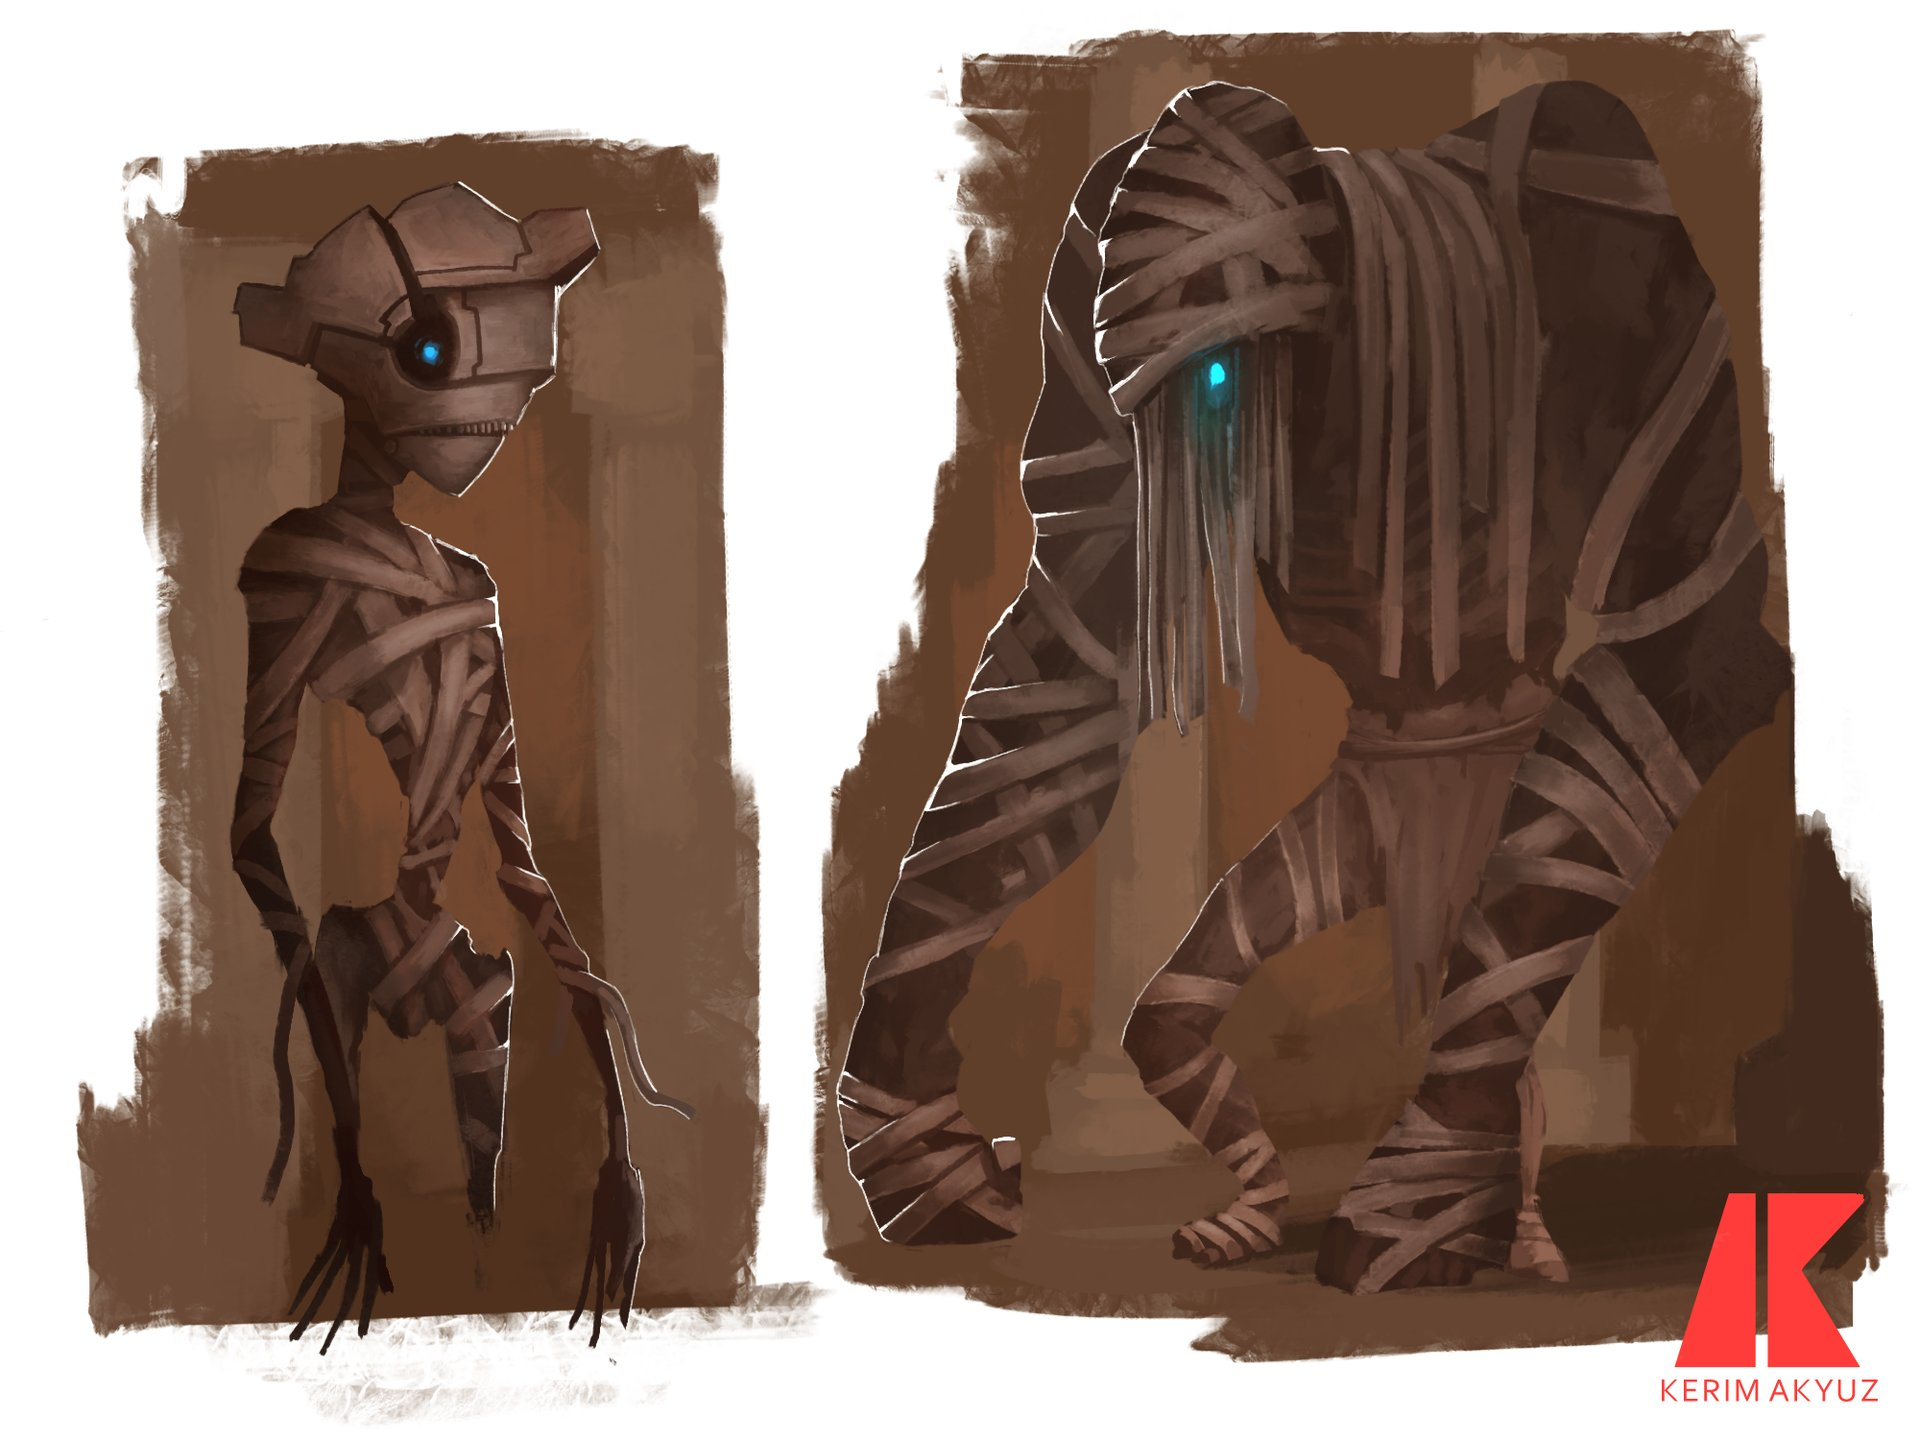 Kerim akyuz cursed mummies